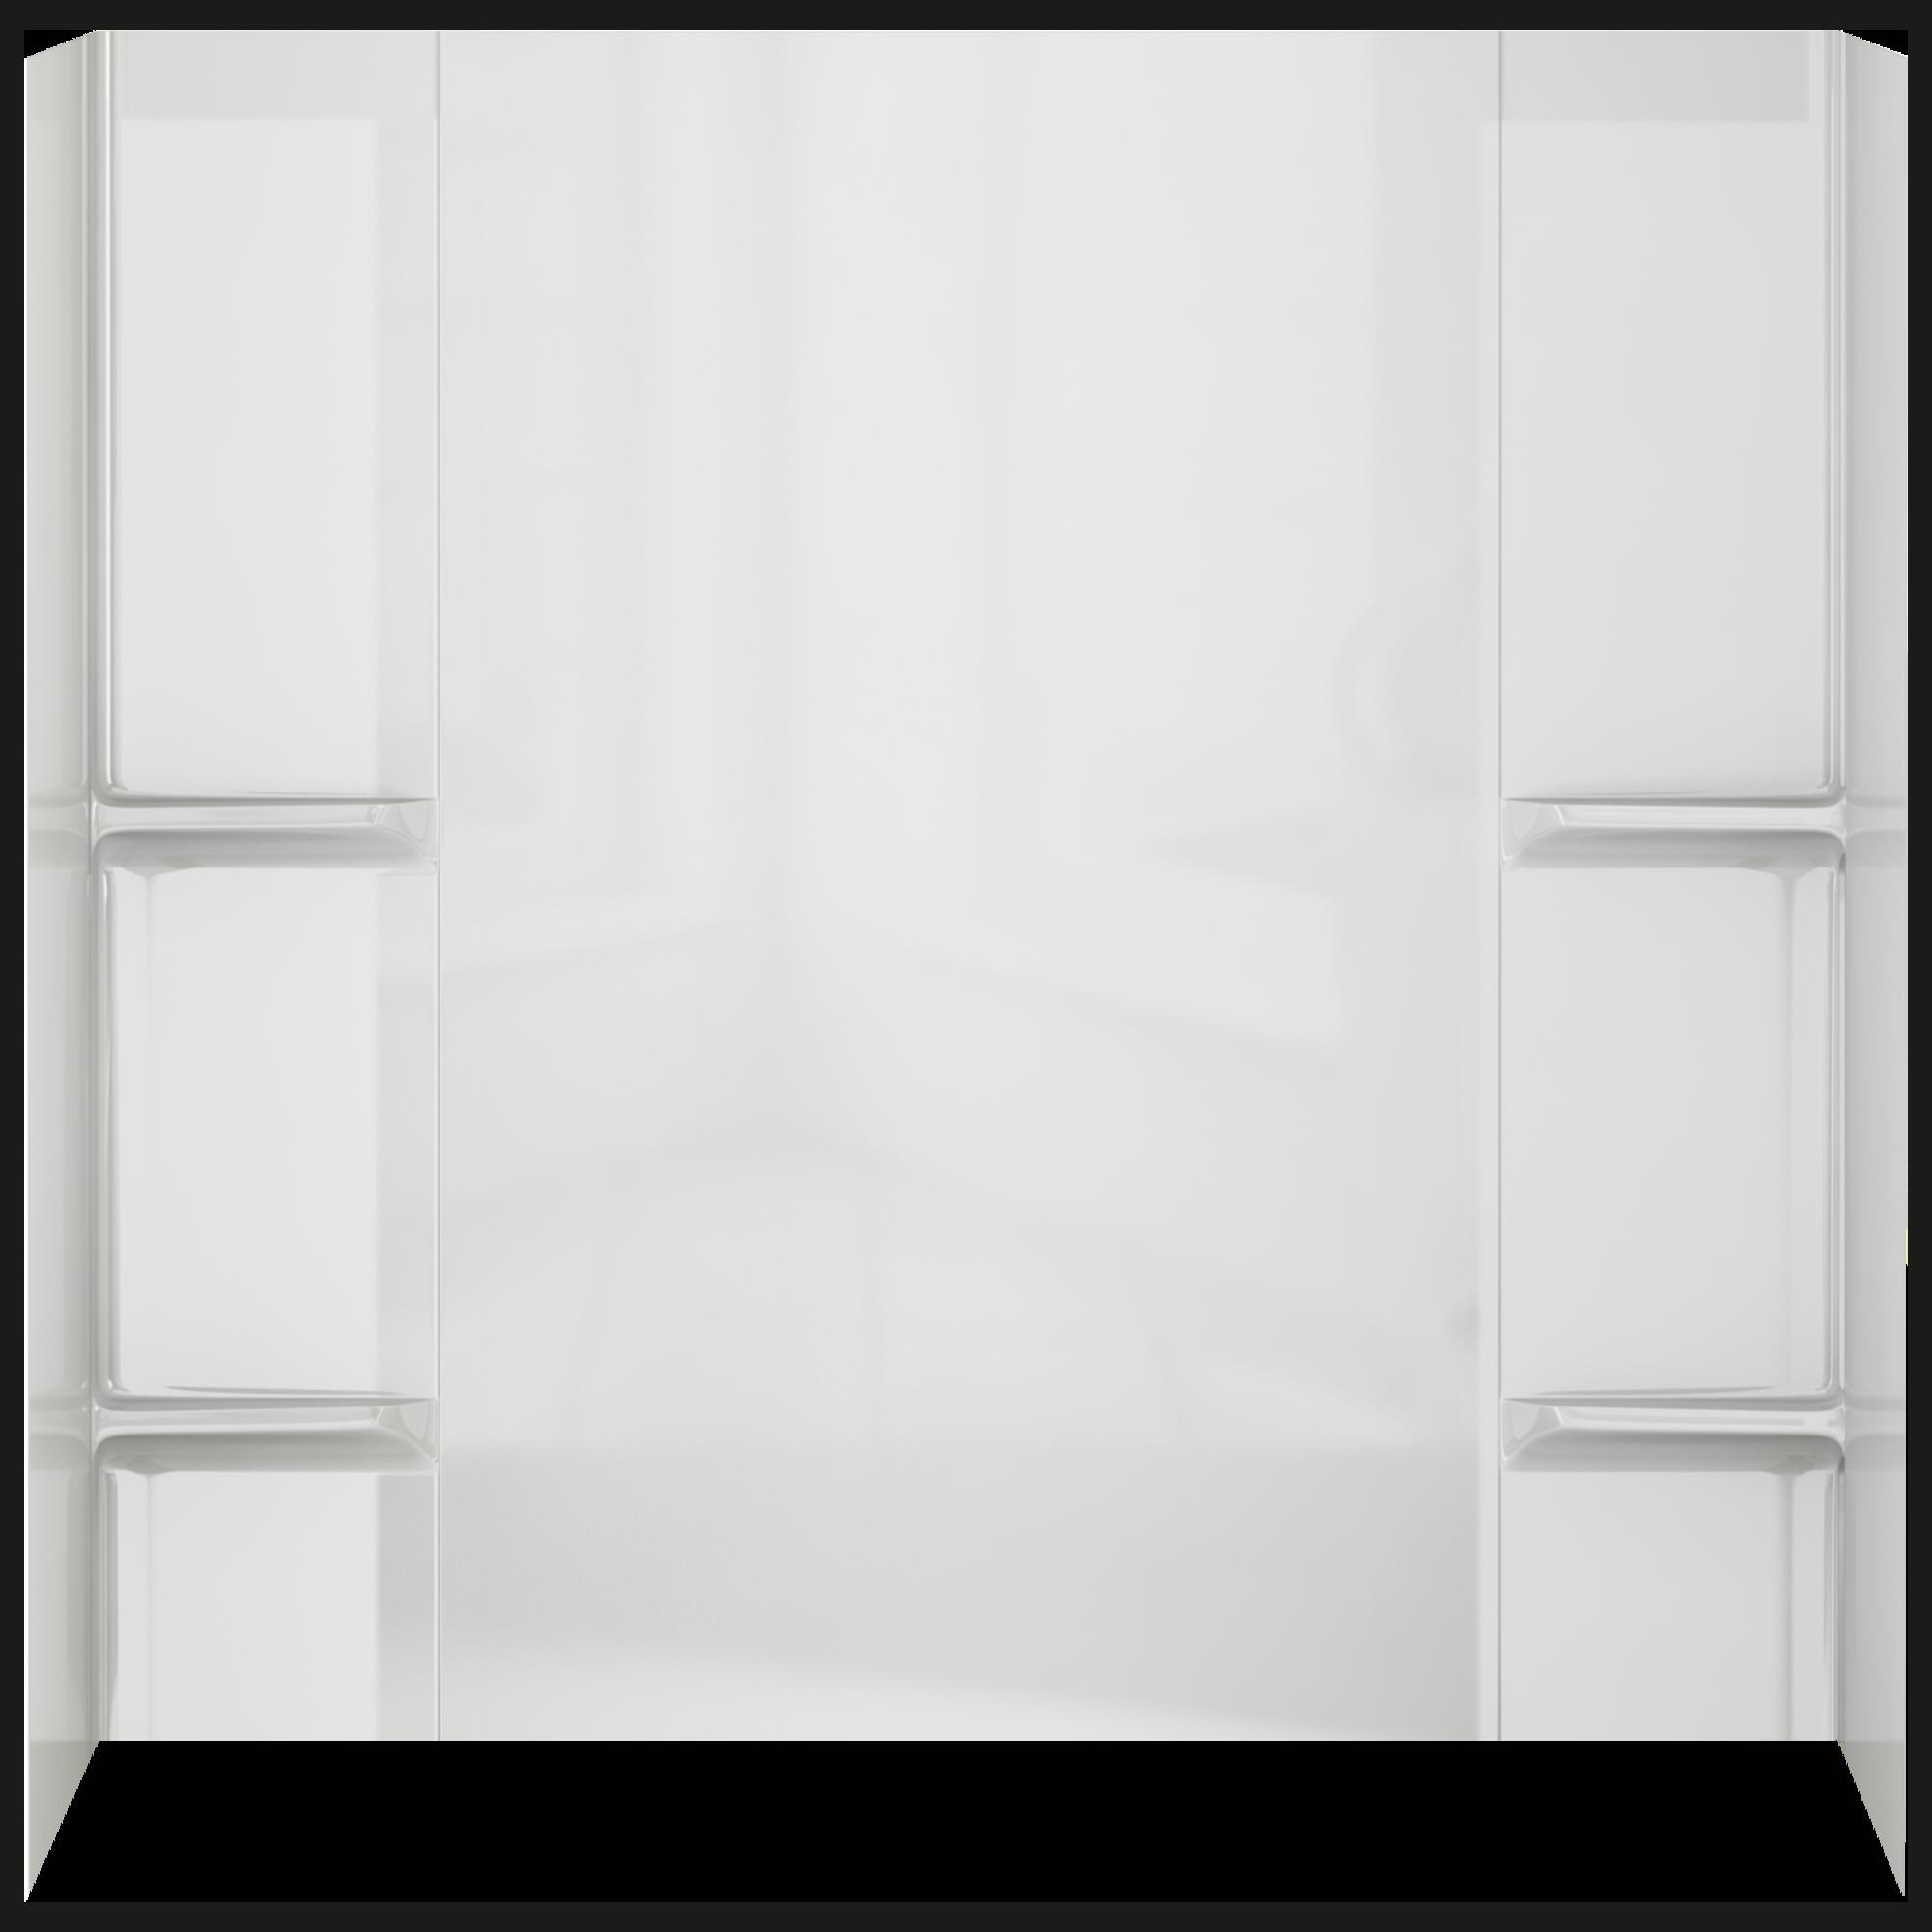 39974 - Aspect<sup>&reg;</sup> Bathtub Wall Set - 5 Piece